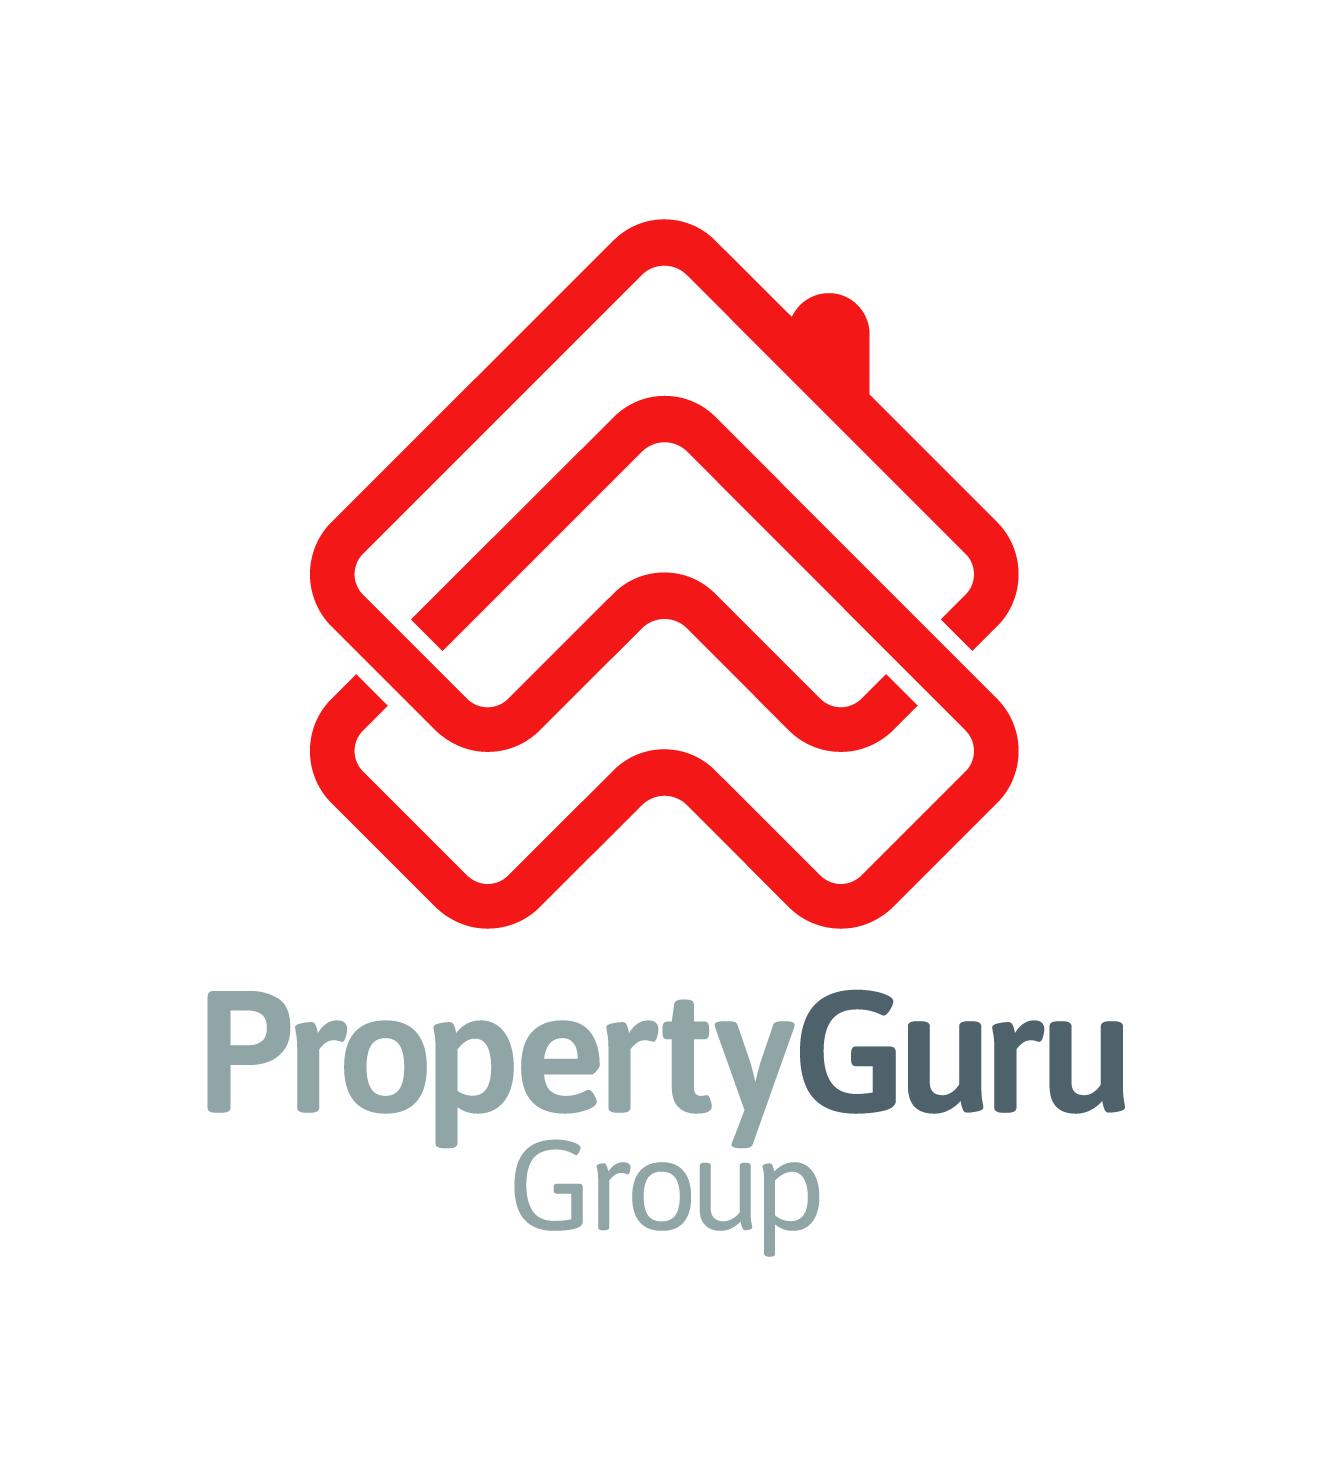 PropertyGuru Group